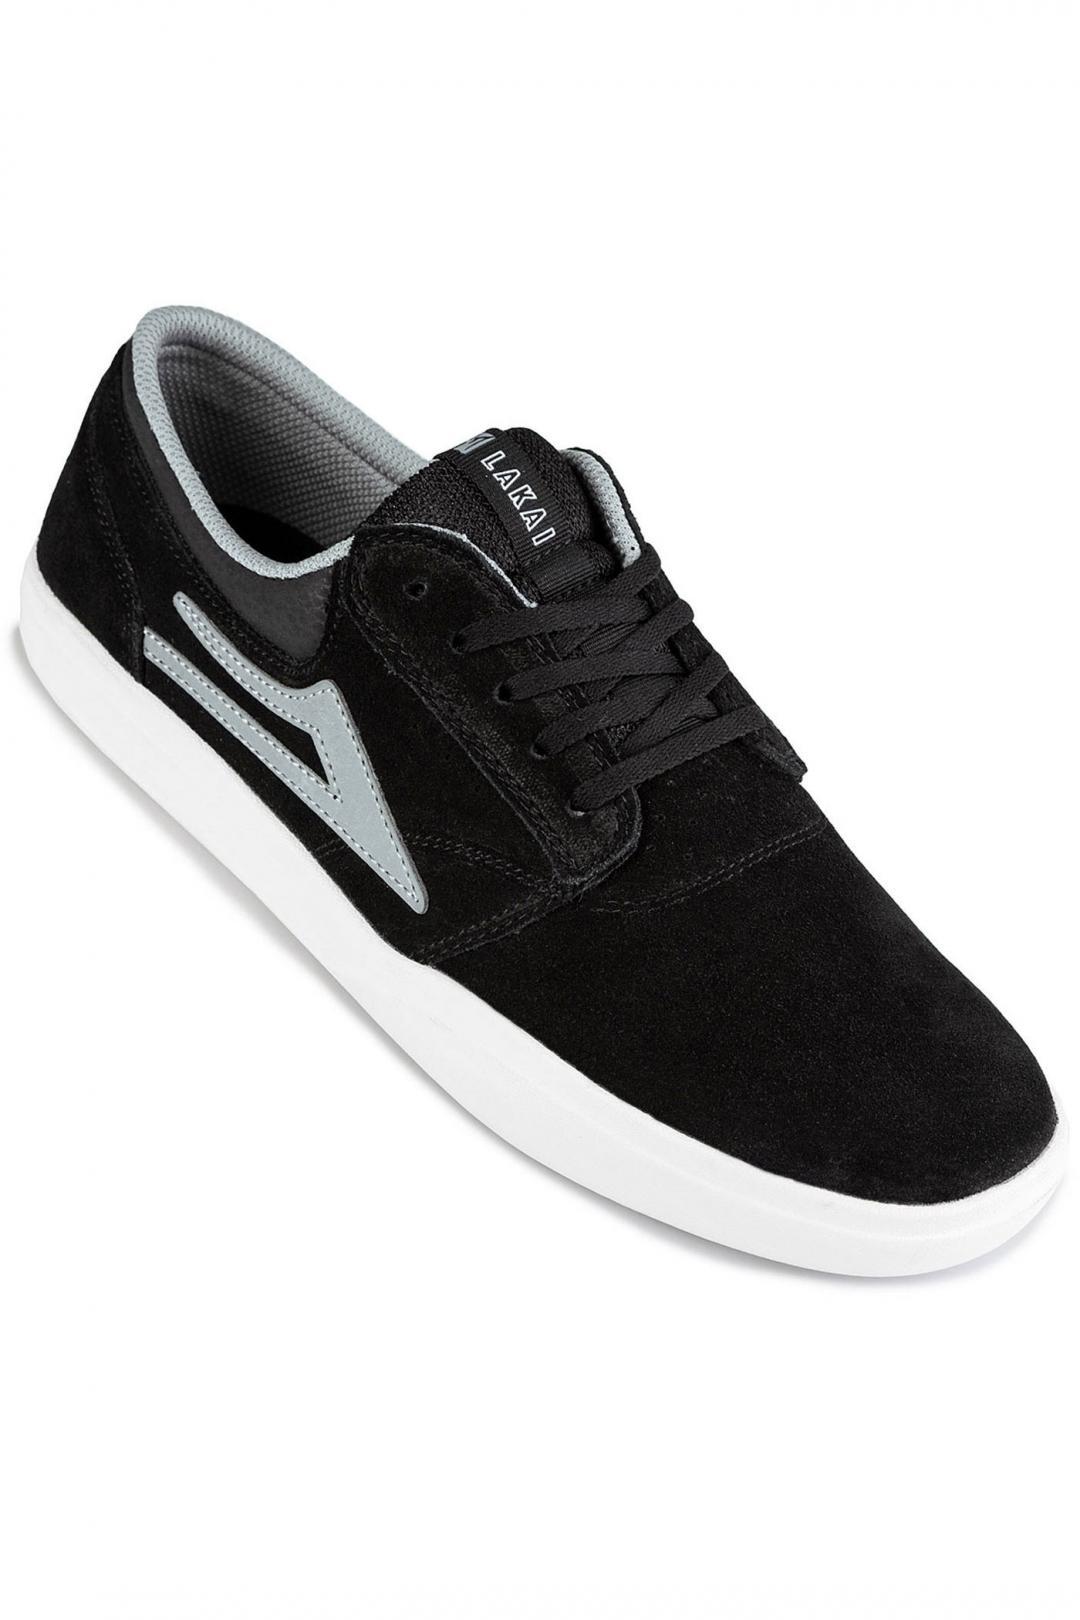 Uomo Lakai Griffin XLK Suede black grey | Sneakers low top